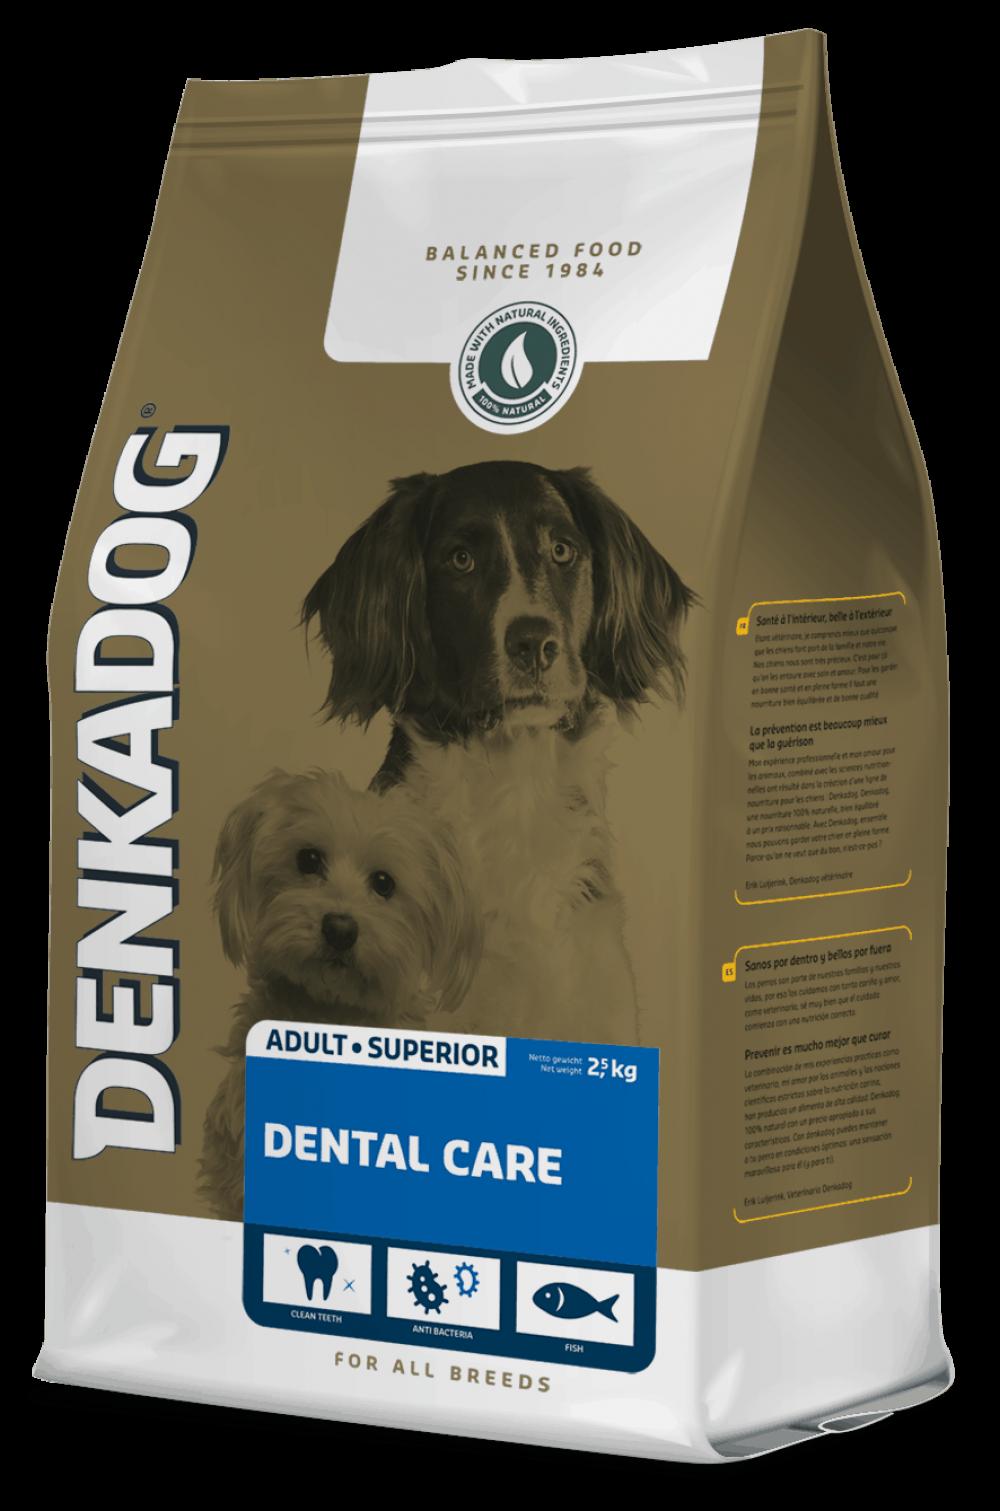 Denkadog Dental Care